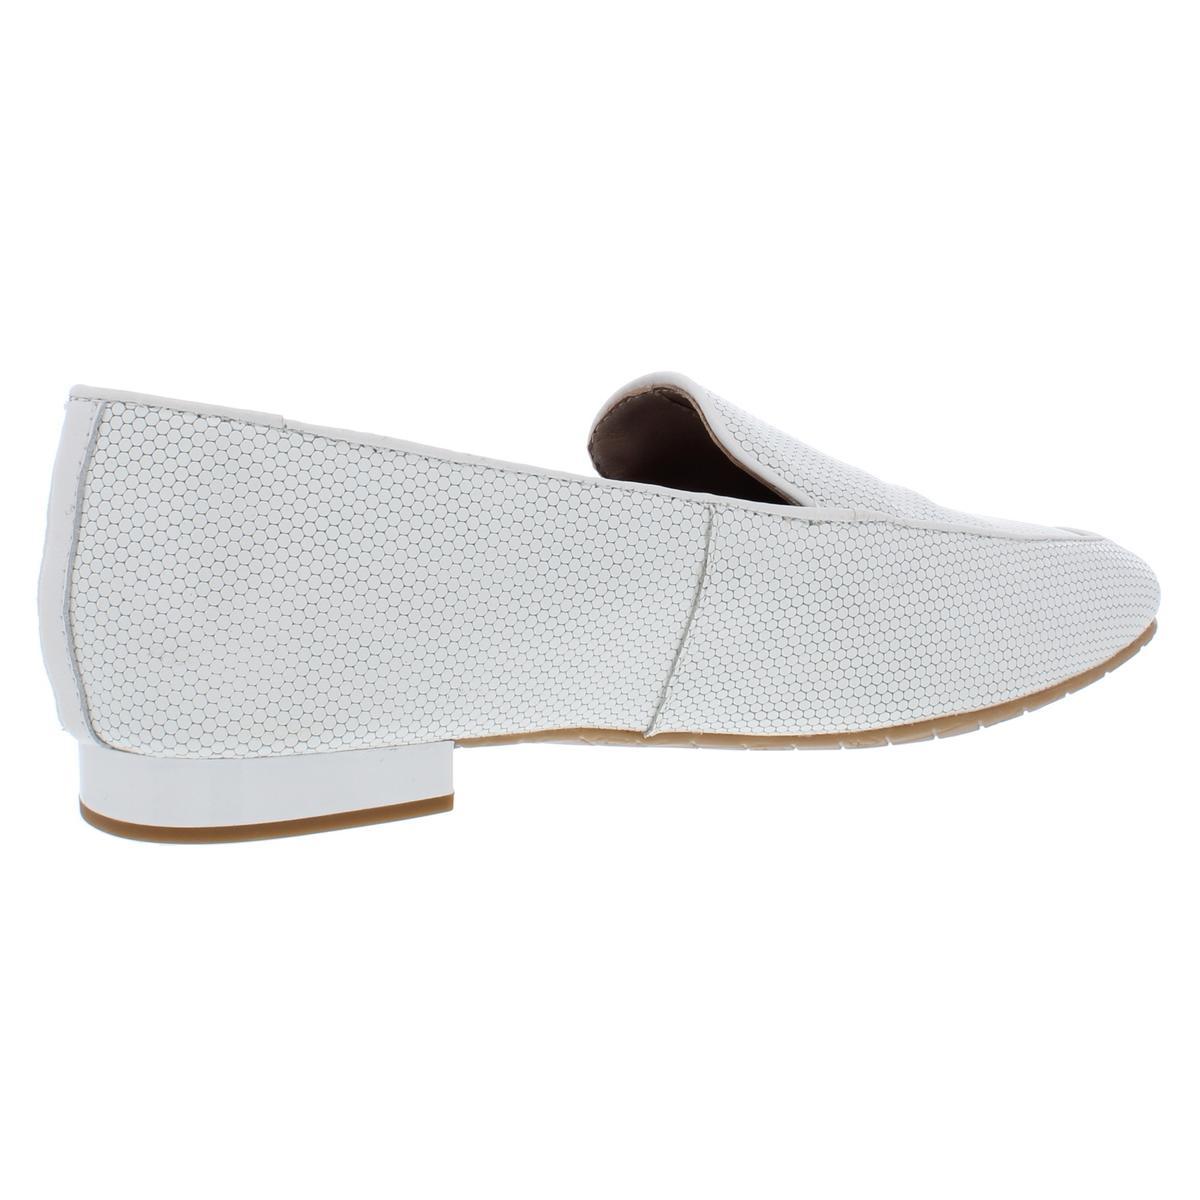 Donald-J-Pliner-Womens-Honey-Slip-On-Loafers-Shoes-BHFO-7808 thumbnail 8